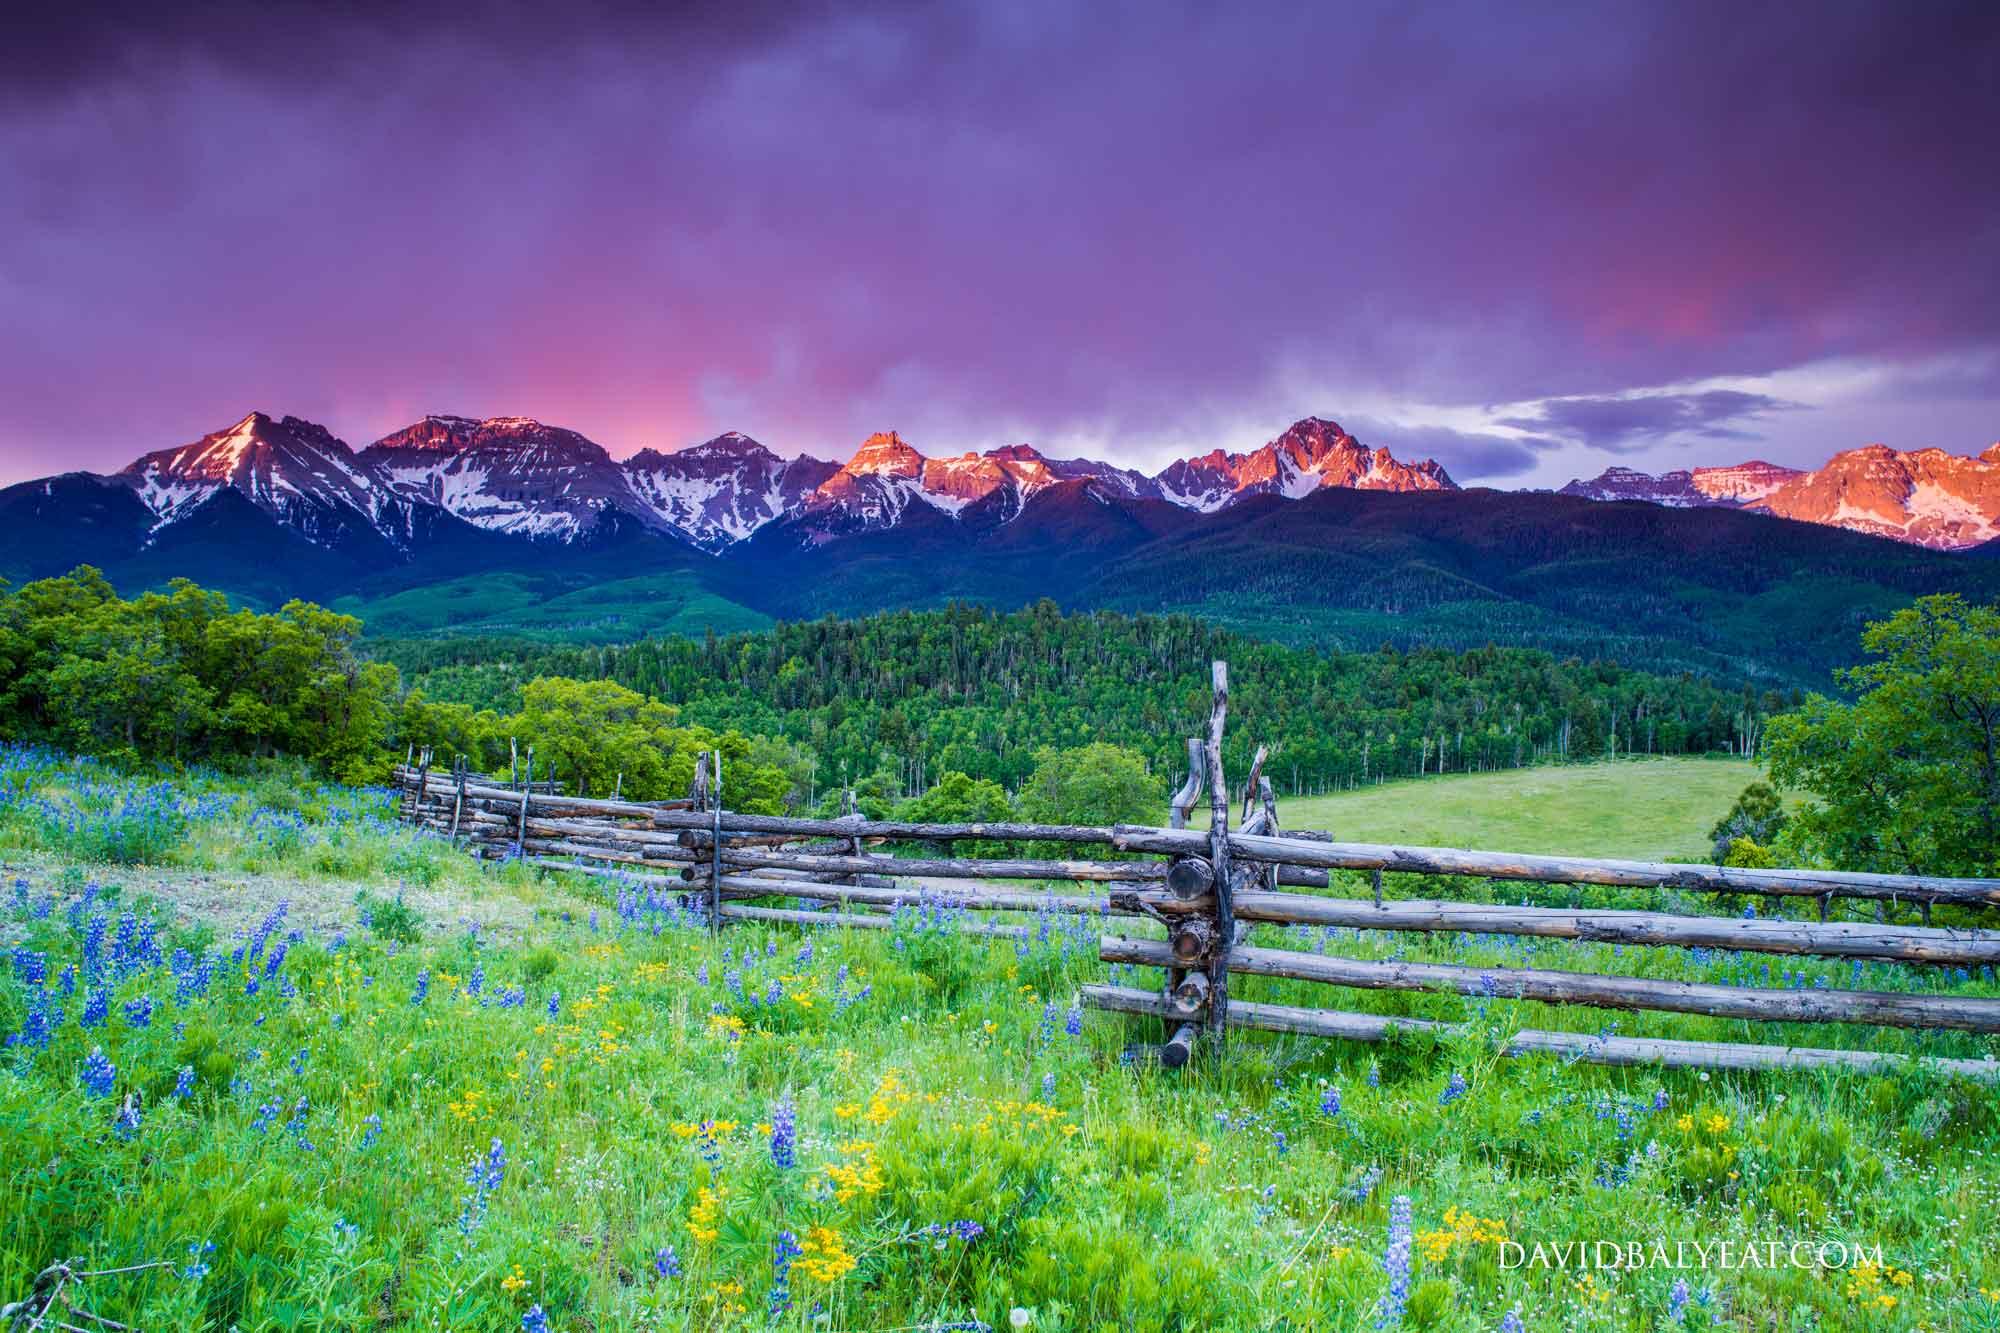 San Juan mountain range Colorado alpine paradise wildflowers high-definition HD professional landscape photography